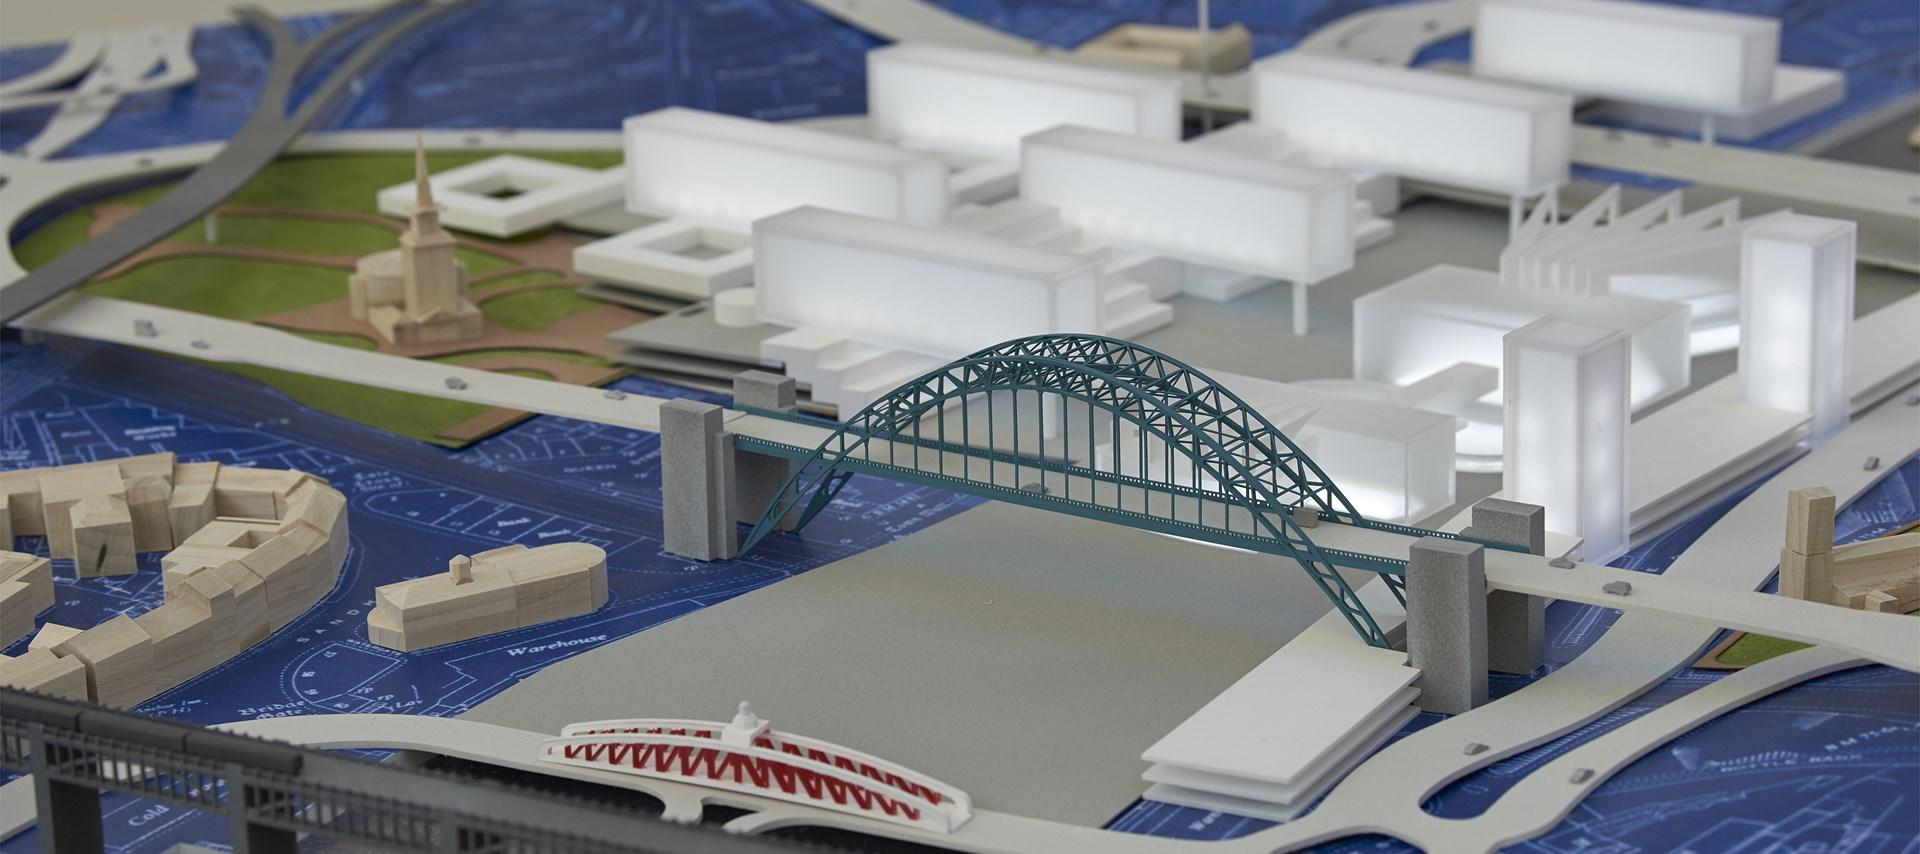 Idea of the North: Installation image (05)